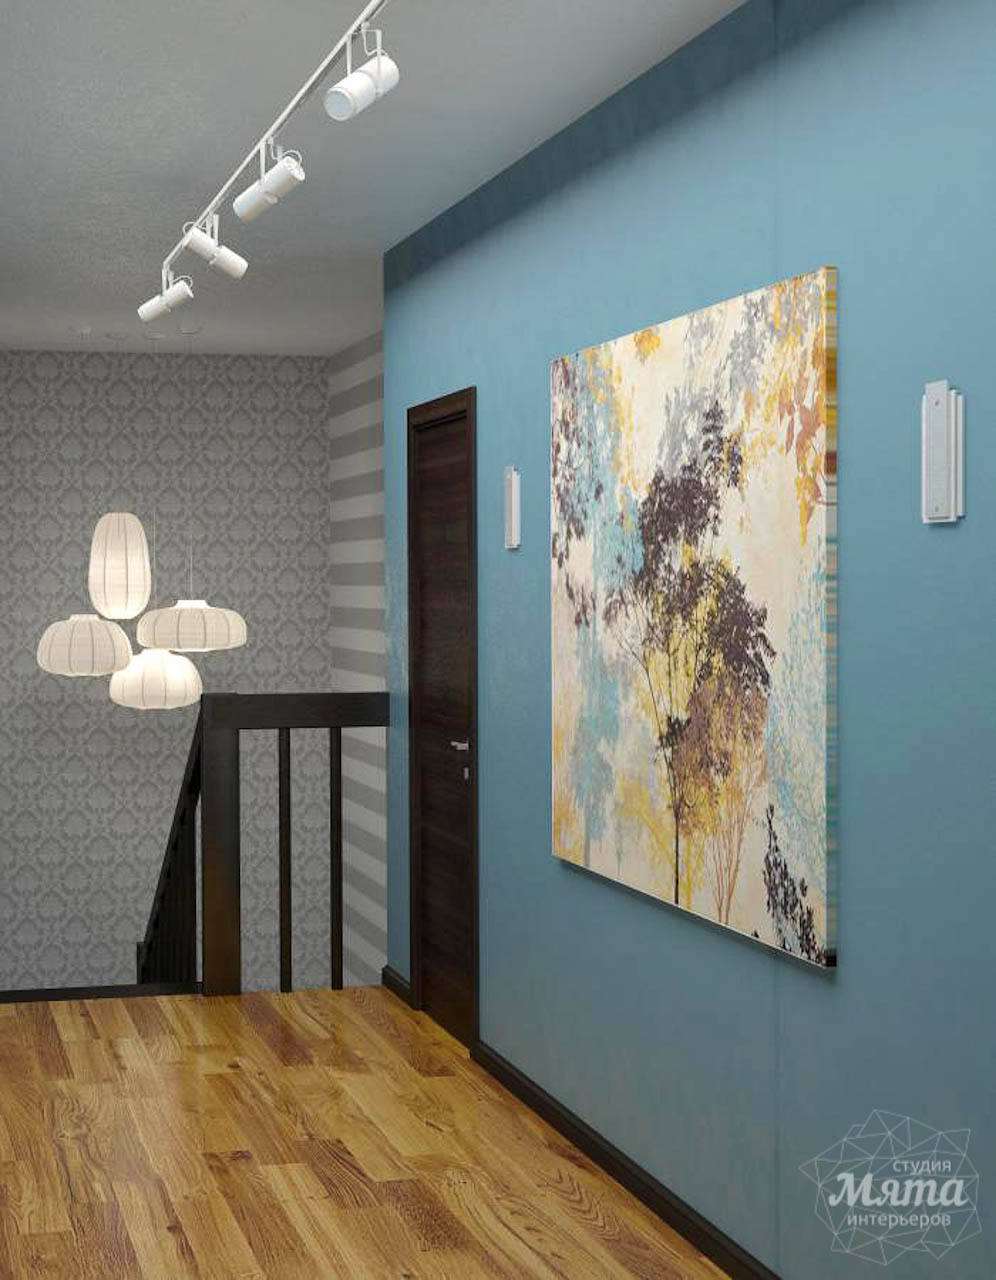 Дизайн проект интерьера коттеджа  в стиле минимализм по ул. Барвинка 15 img1256363078